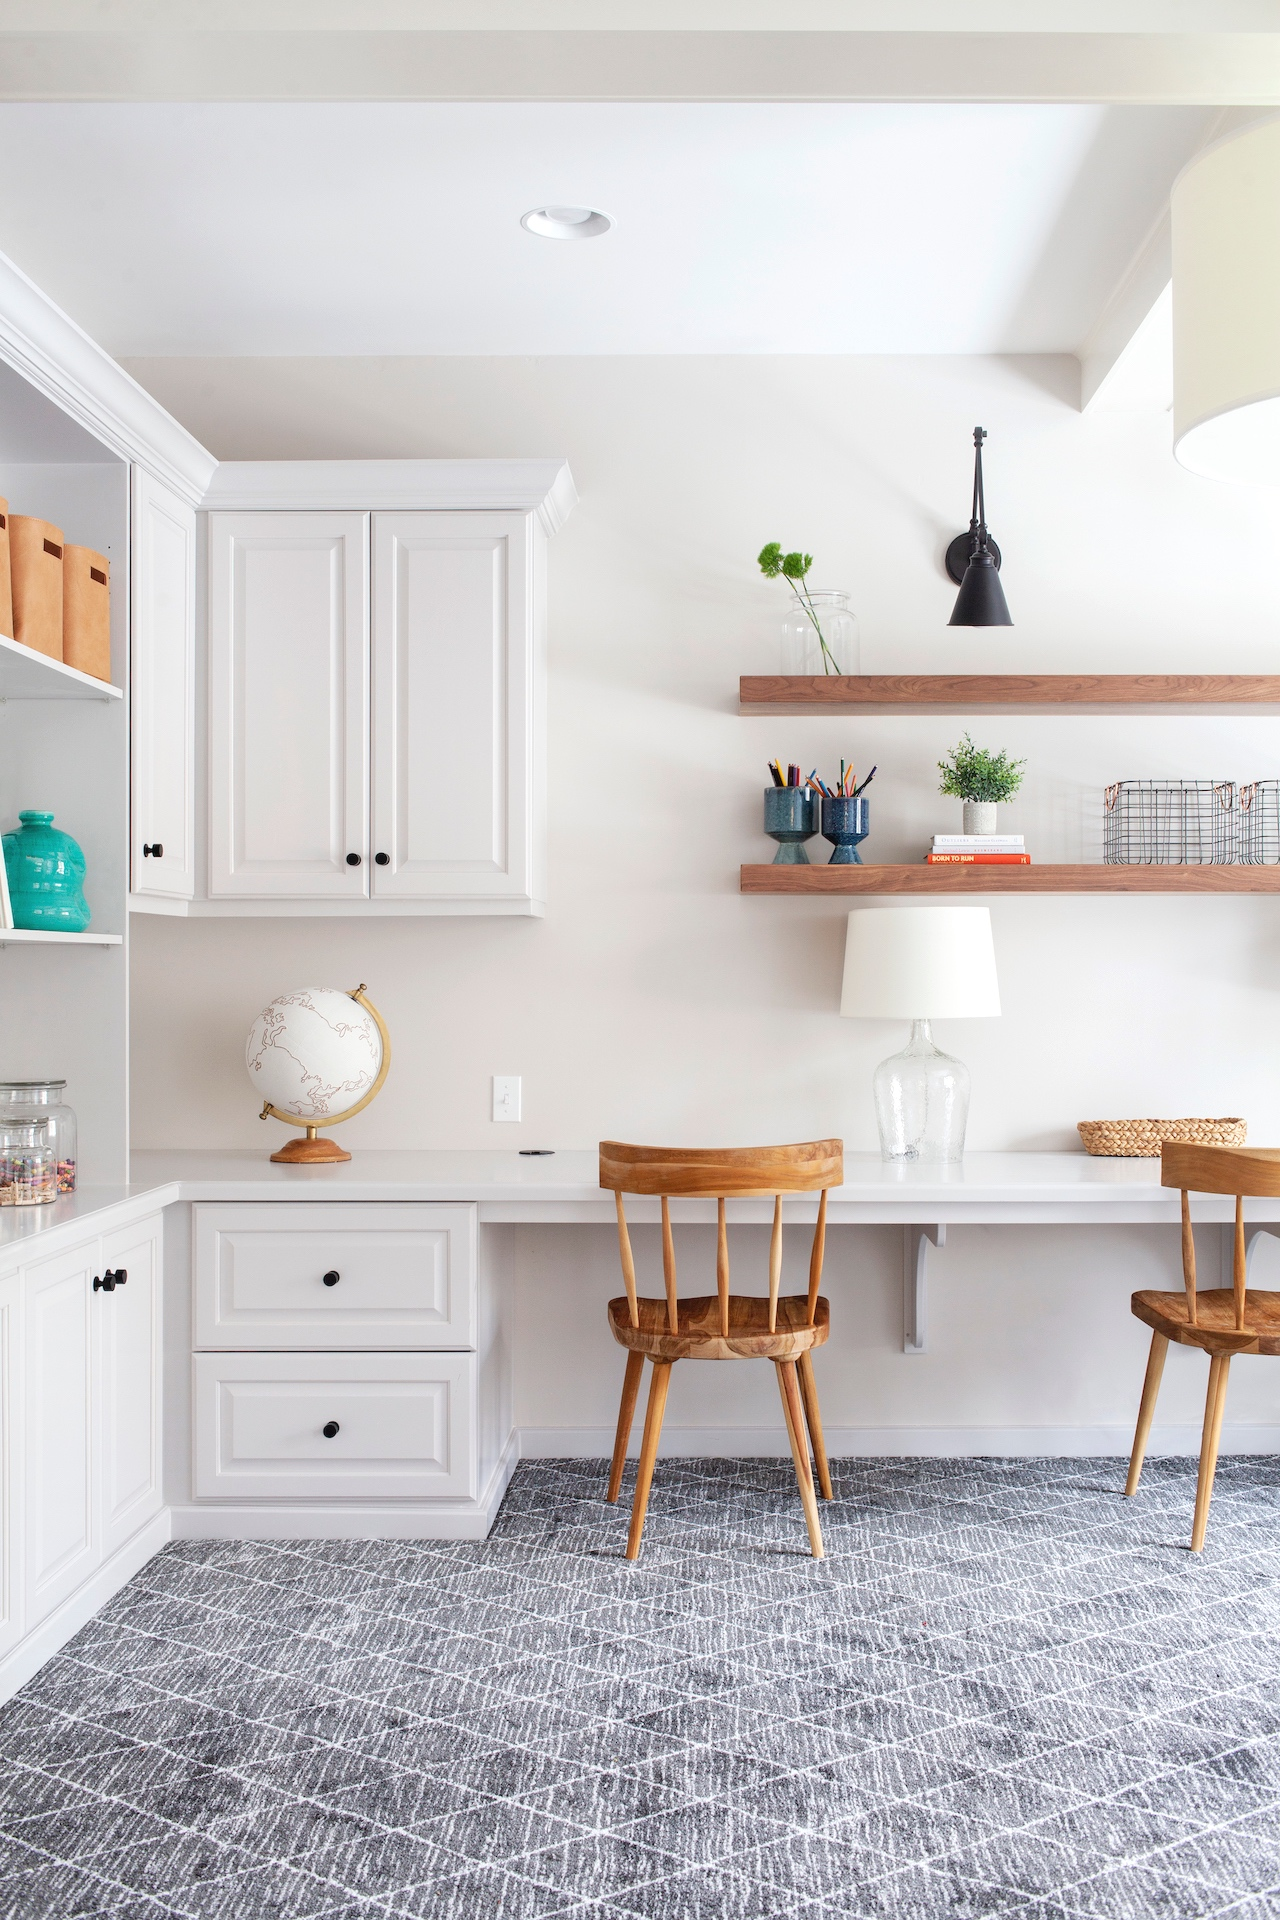 SHOP THE LOOK    |     Berkley Pots ,  Canvas Globe ,  Esme Chair ,  Morland Adjustable Sconce ,  Medium French Mason Jar